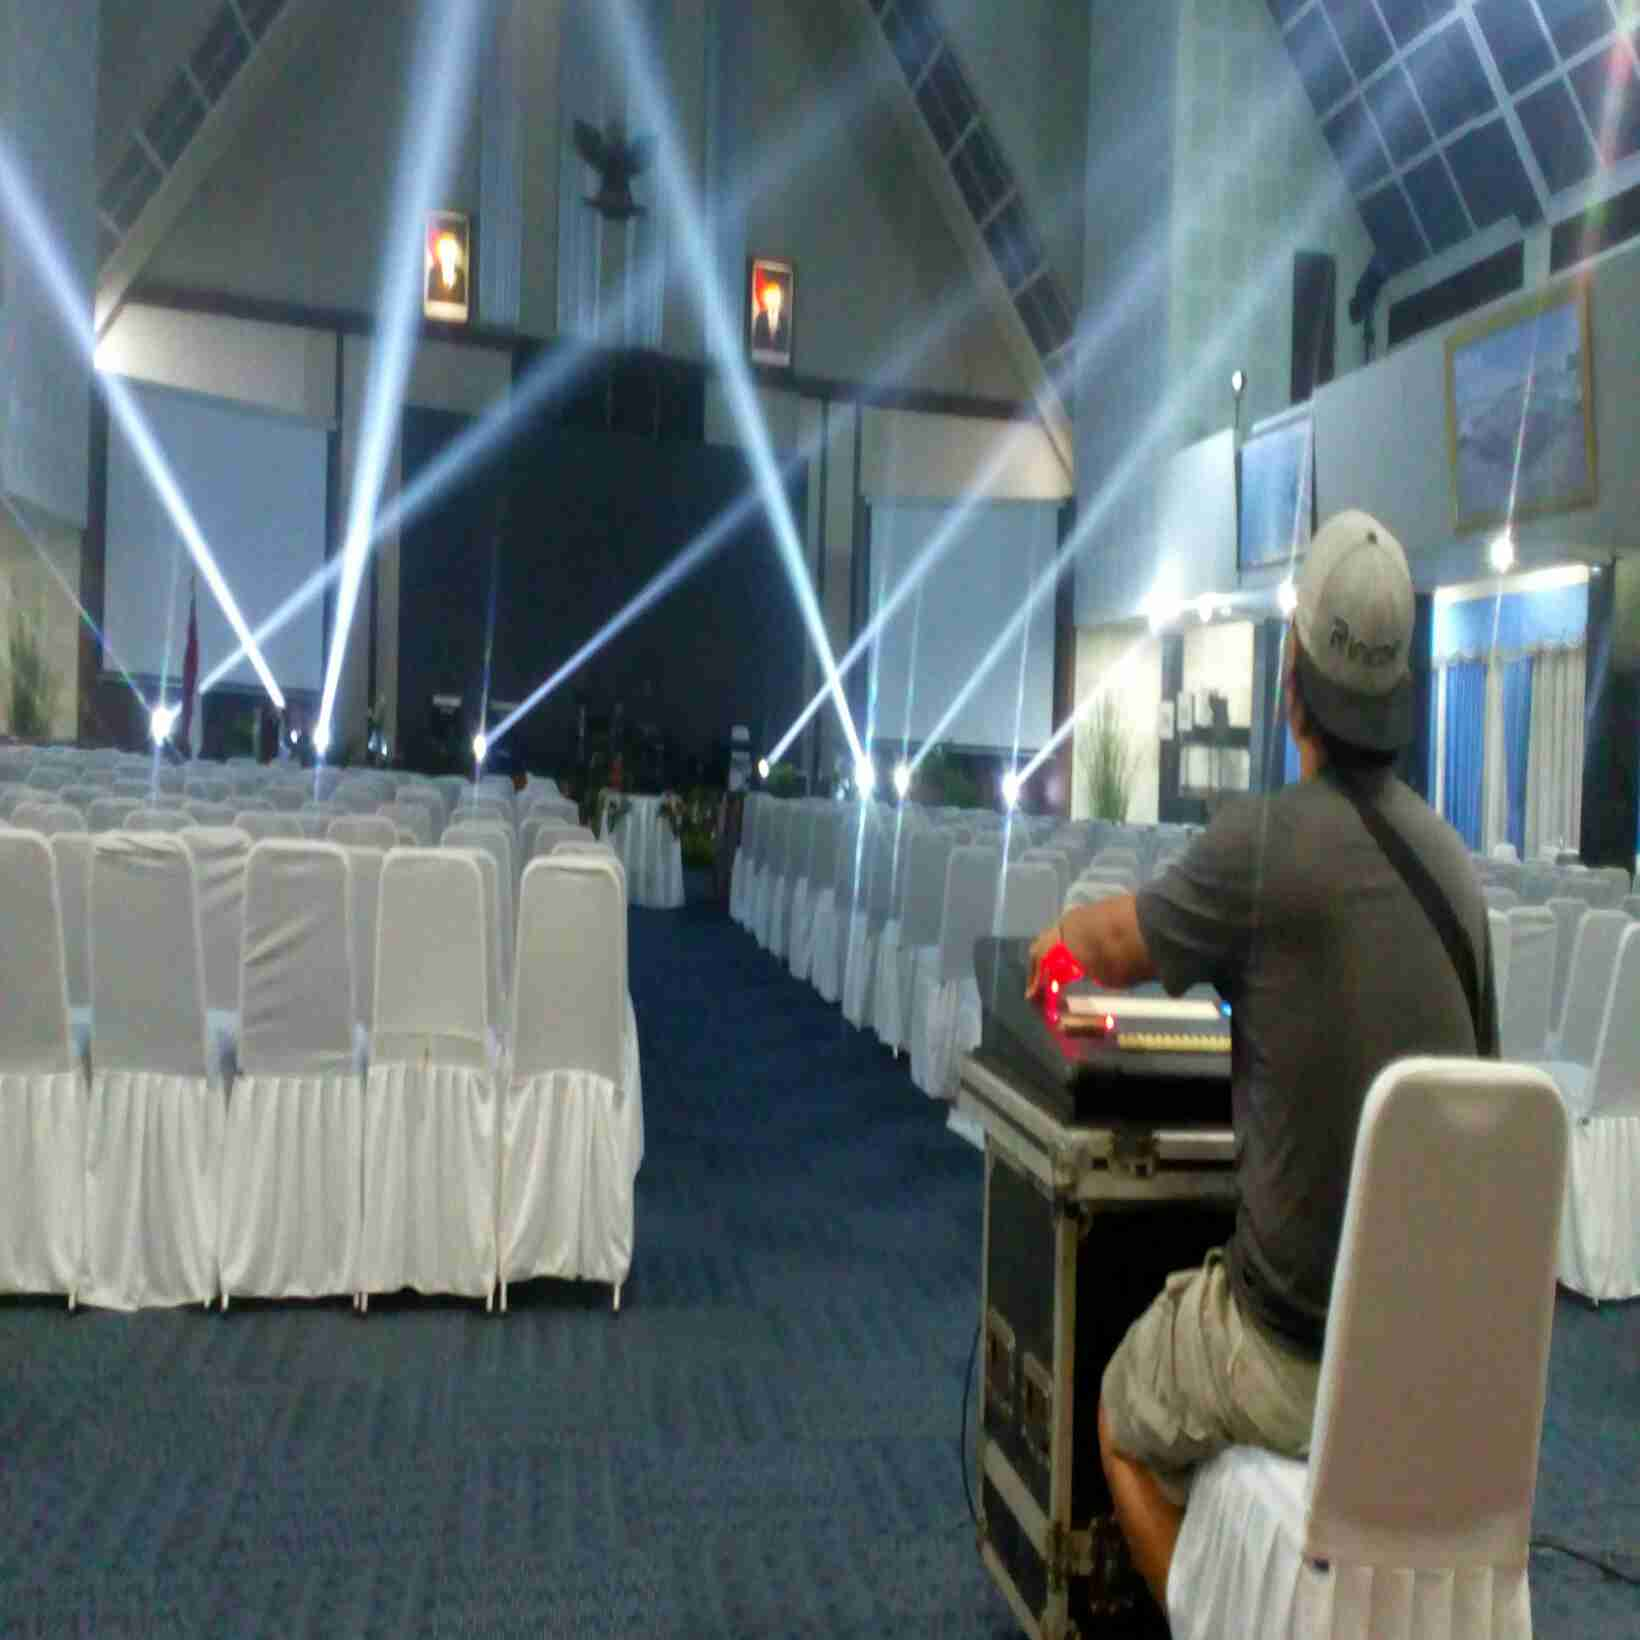 menyewakan alat produksi all produksi riging stage barikade sarnavil ,sound system',lighting,LED scr